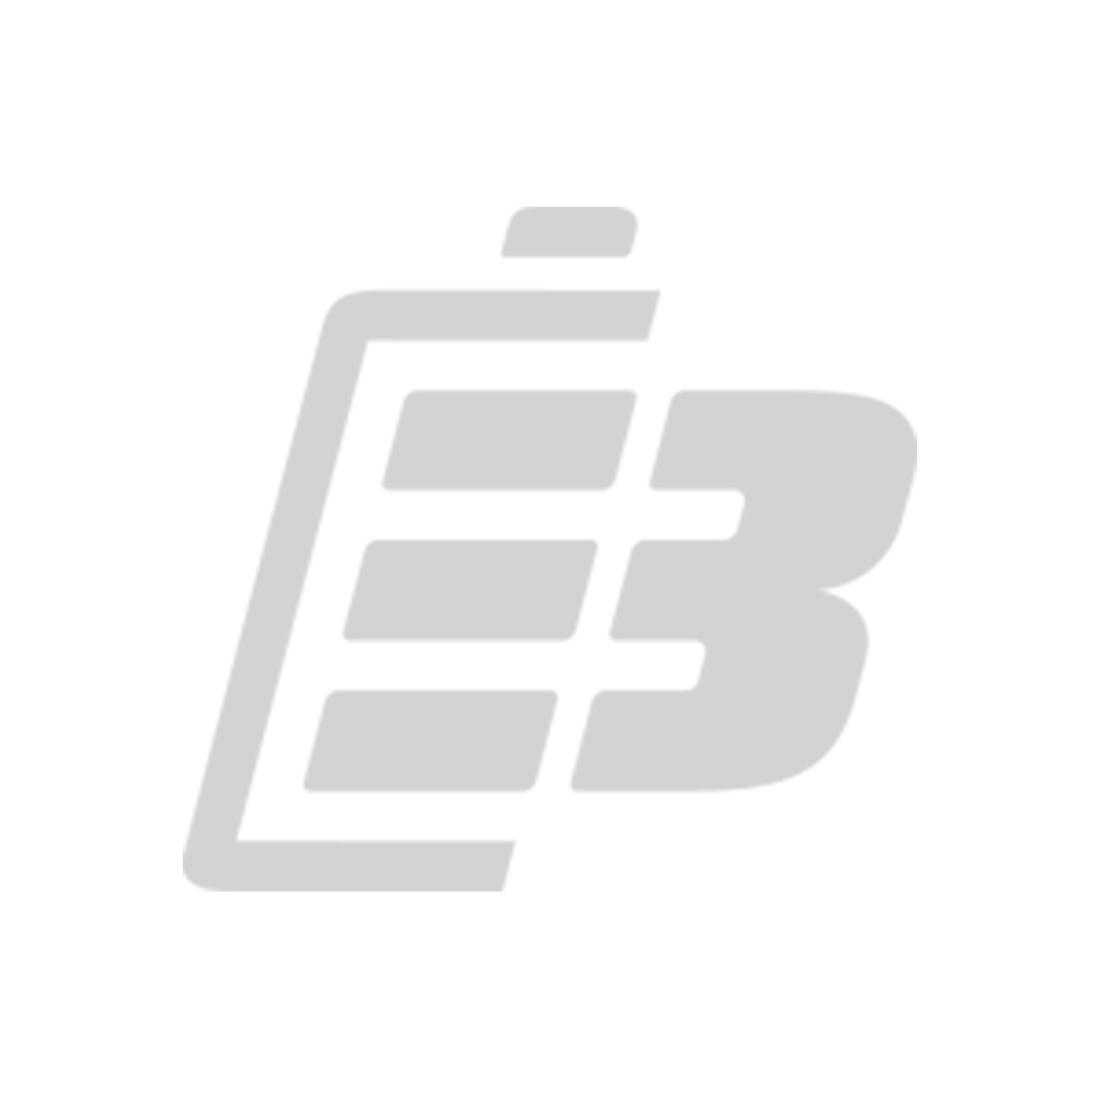 Satellite phone battery Inmarsat IsatPhone Pro_1